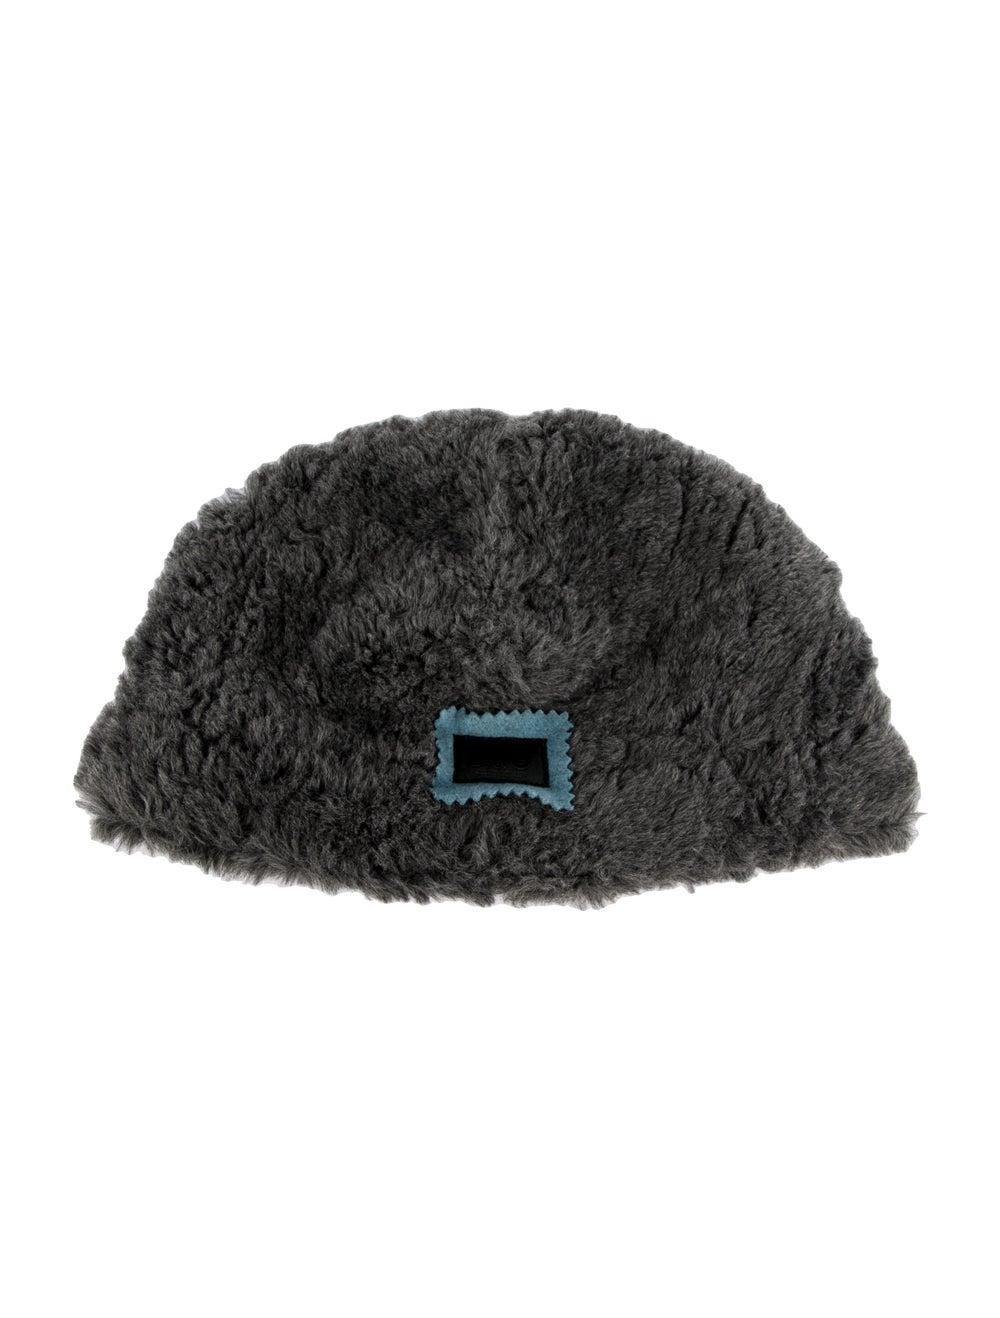 D&G Woven Logo Hat Grey - image 1